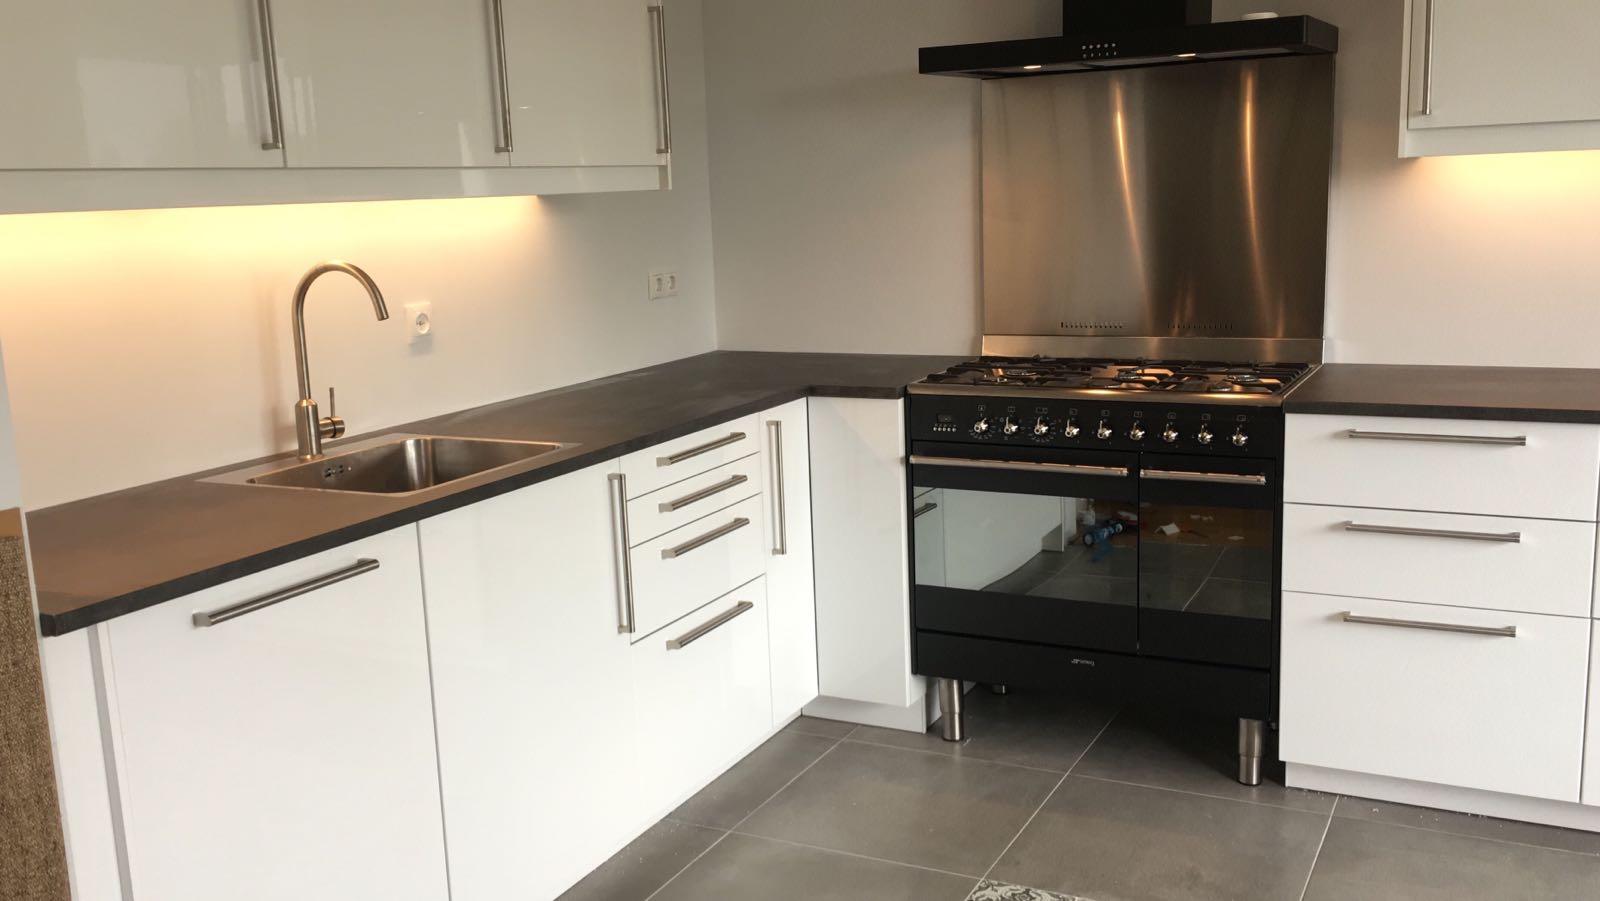 Keuken Industriele Smeg : Ikea keuken apparaten informatie over de keuken informatie